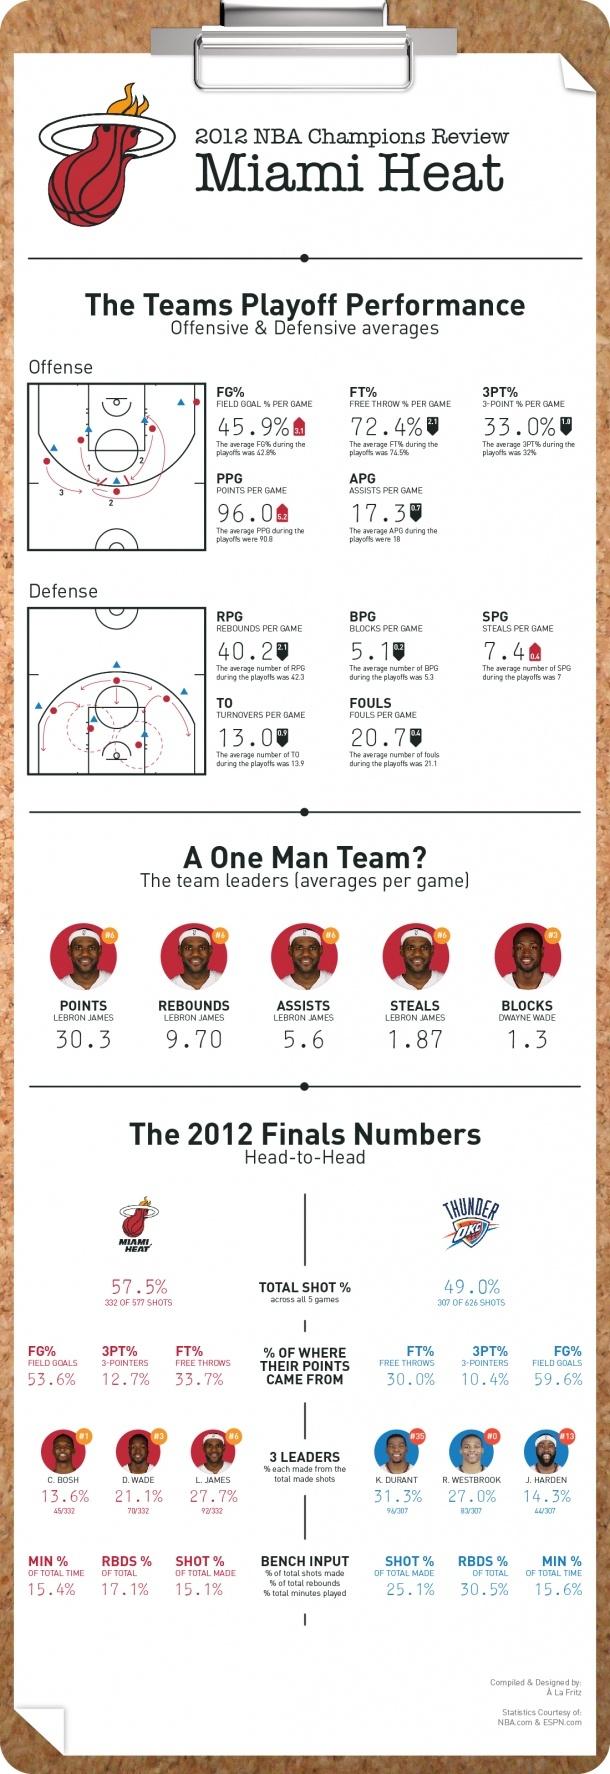 2012 NBA Champions Review: Miami Heat[INFOGRAPHIC]